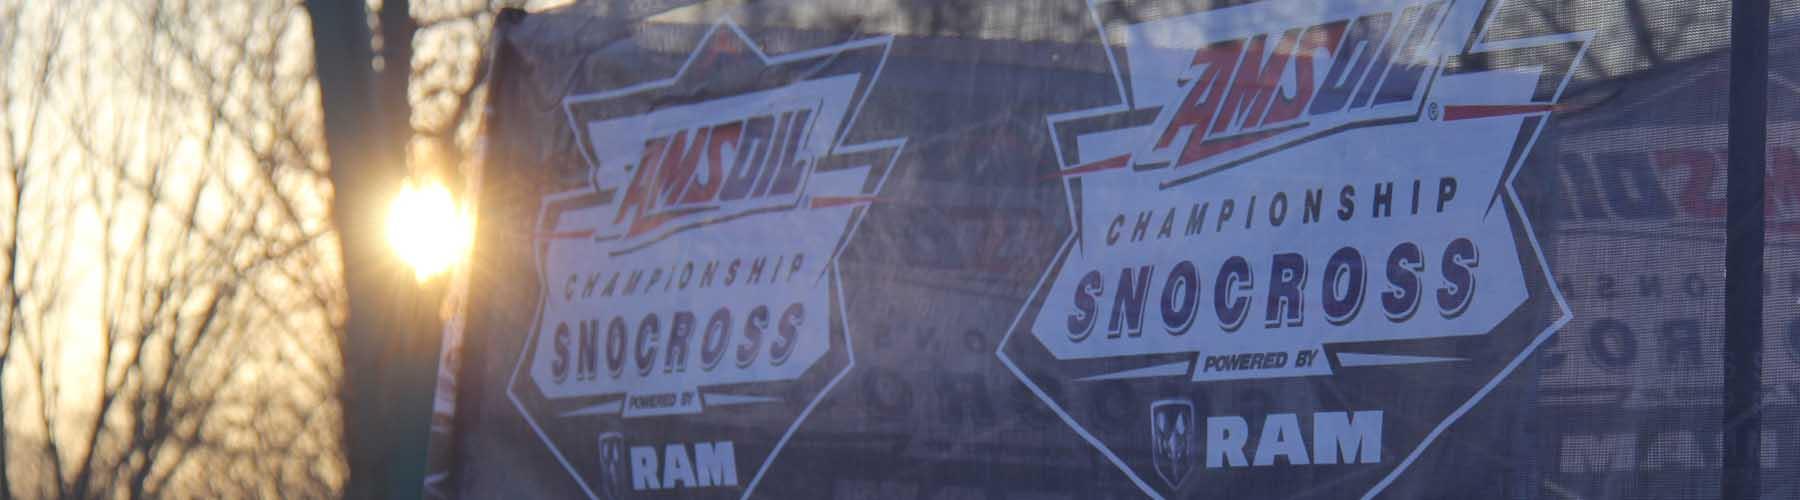 AMSOIL racers - full size